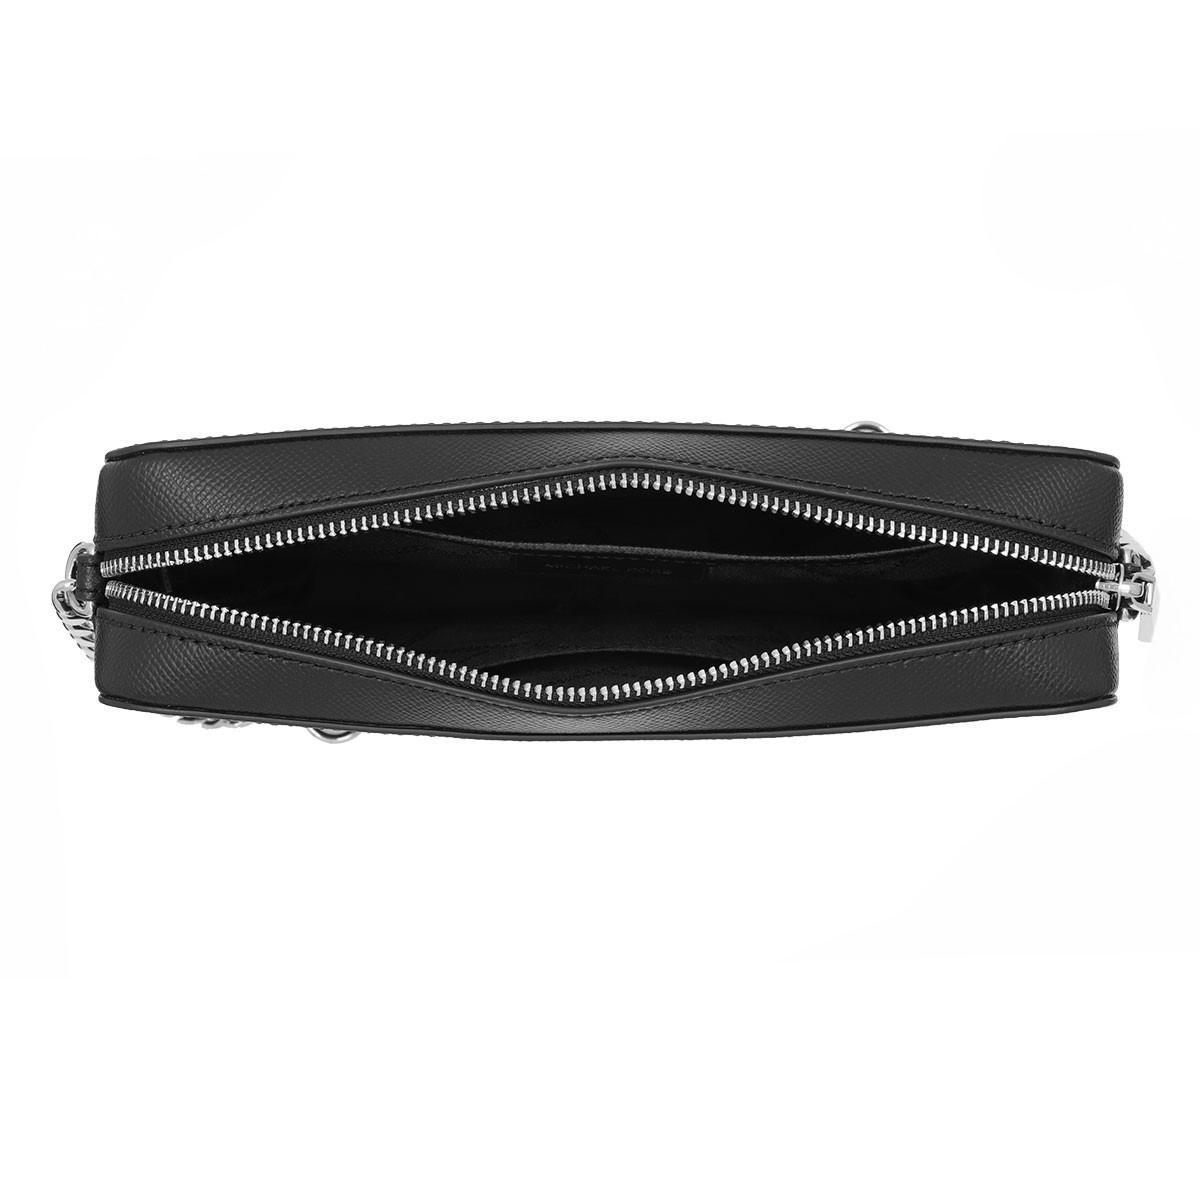 MICHAEL Michael Kors Leather Large Ew Crossbody Bag Black